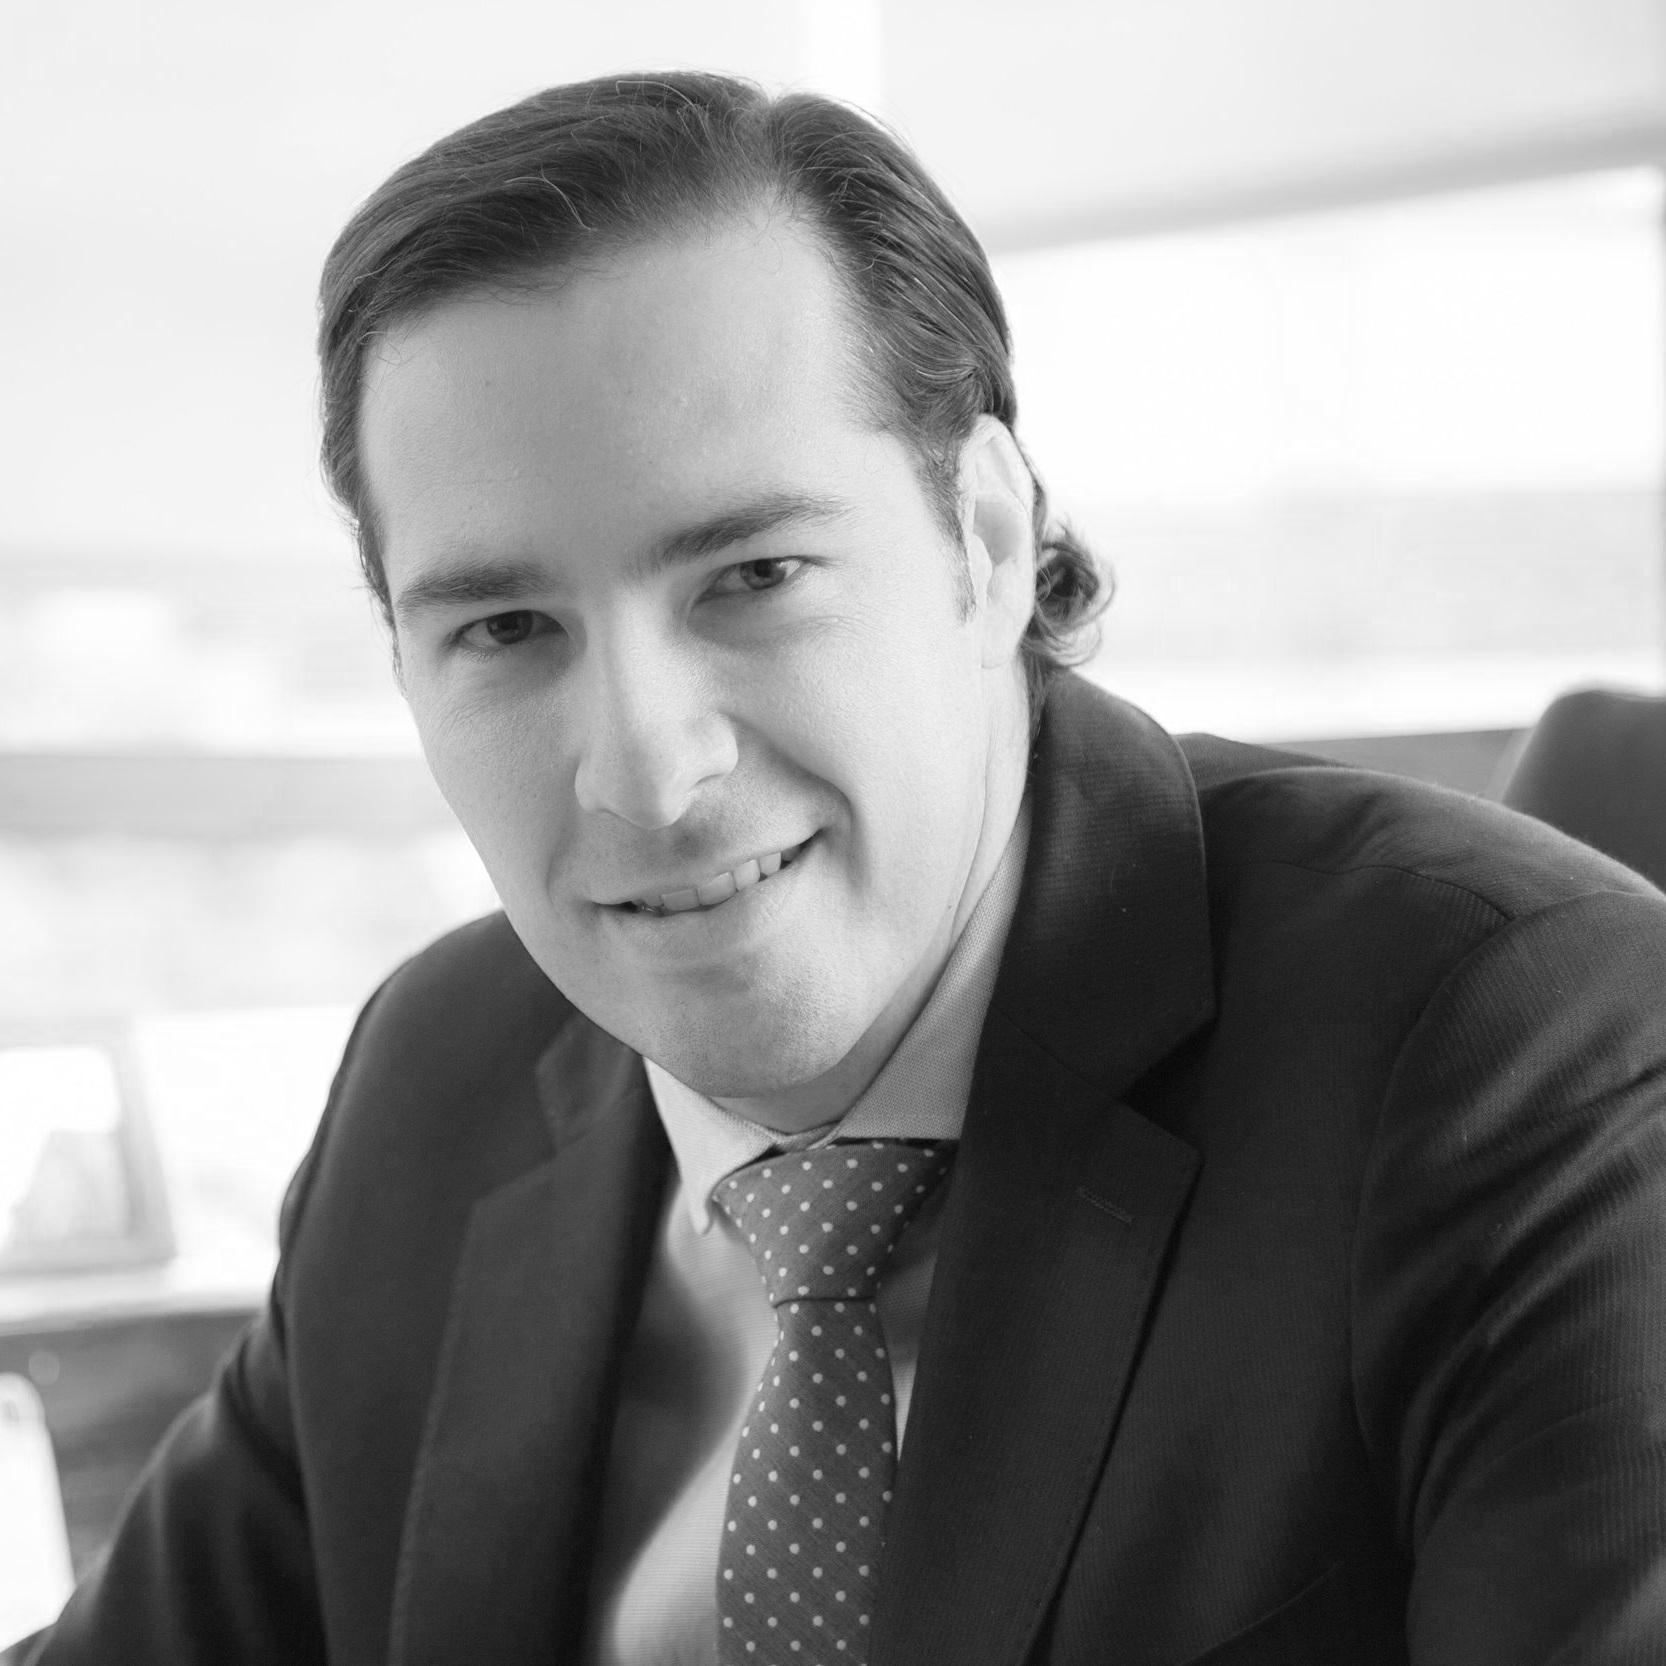 José Ricardo Puyana, Embassy of Colombia to the United Kingdom